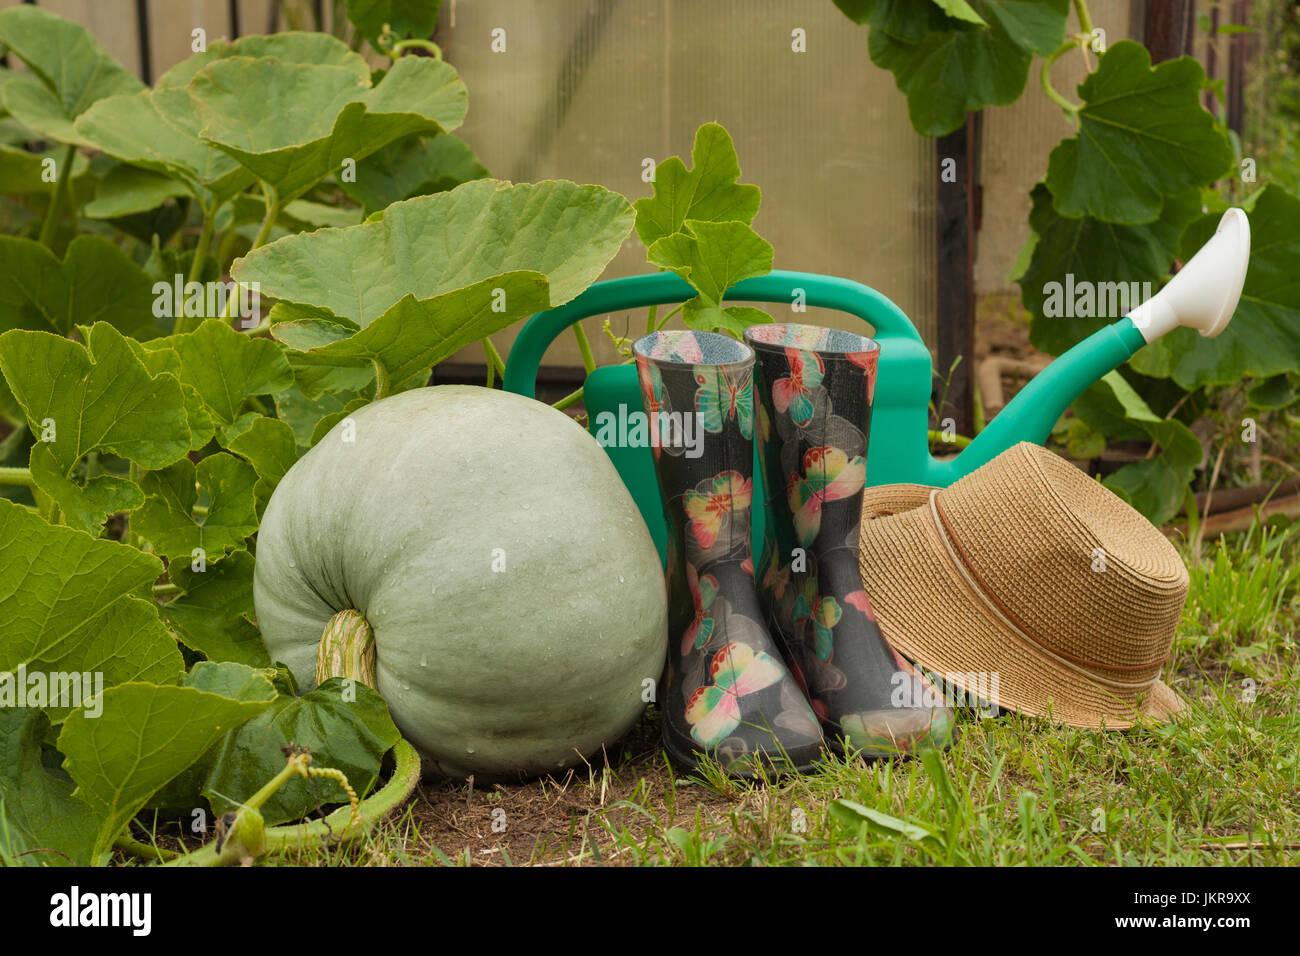 Fresh Pumpkin And Garden Tools On Vegetable Garden Fresh Pumpkin